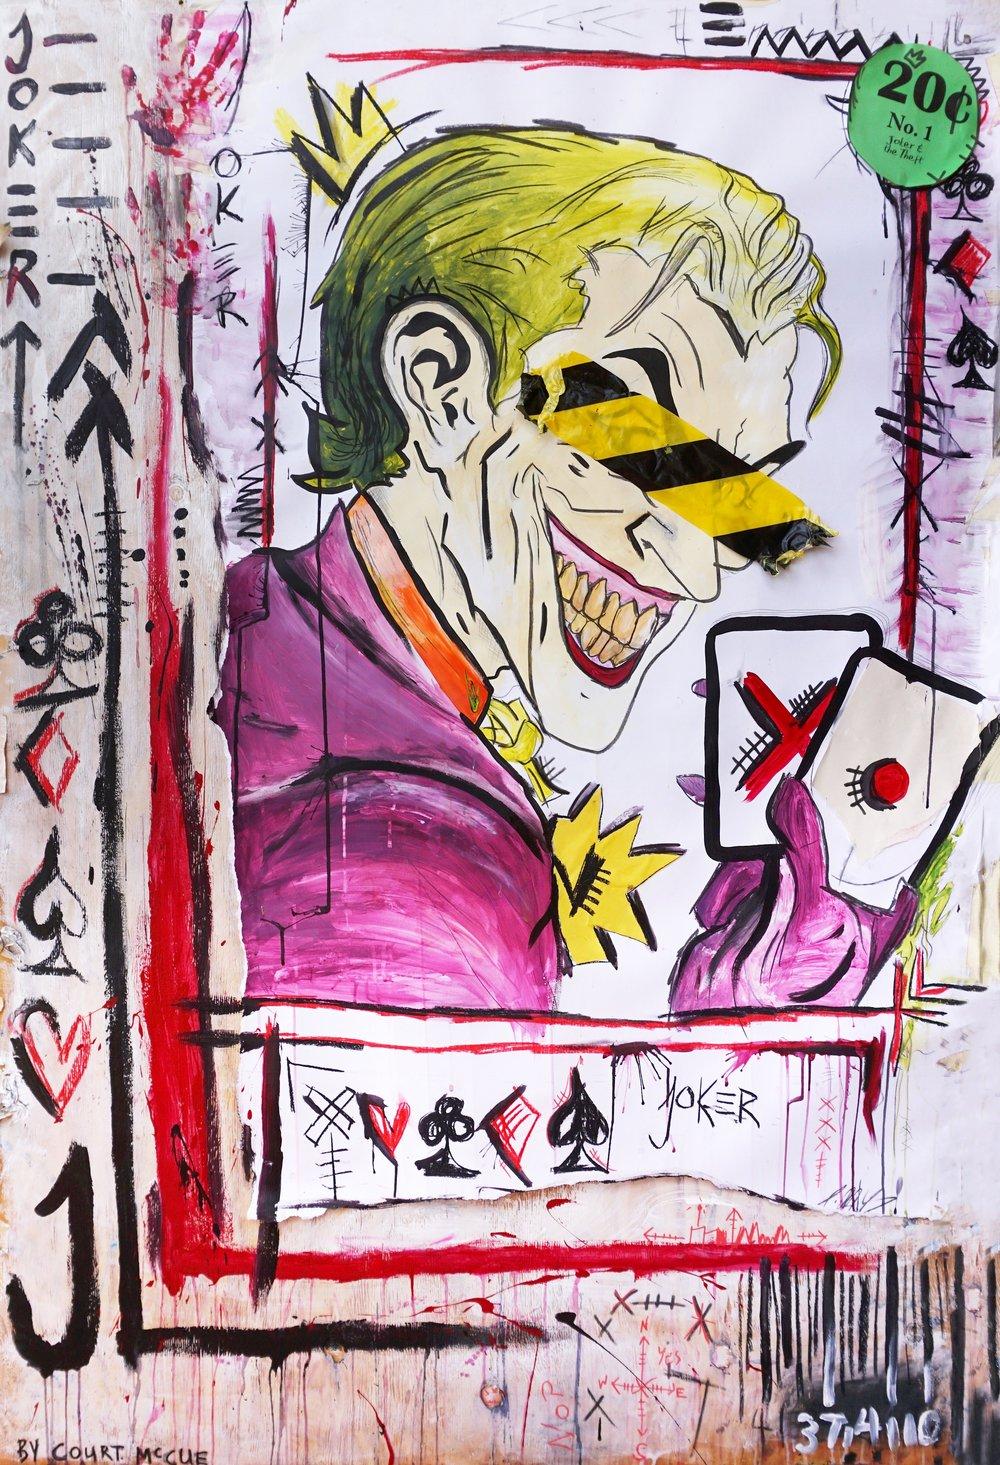 Behind the Mask - Joker  120cm x 180cm Mixed Media on Board